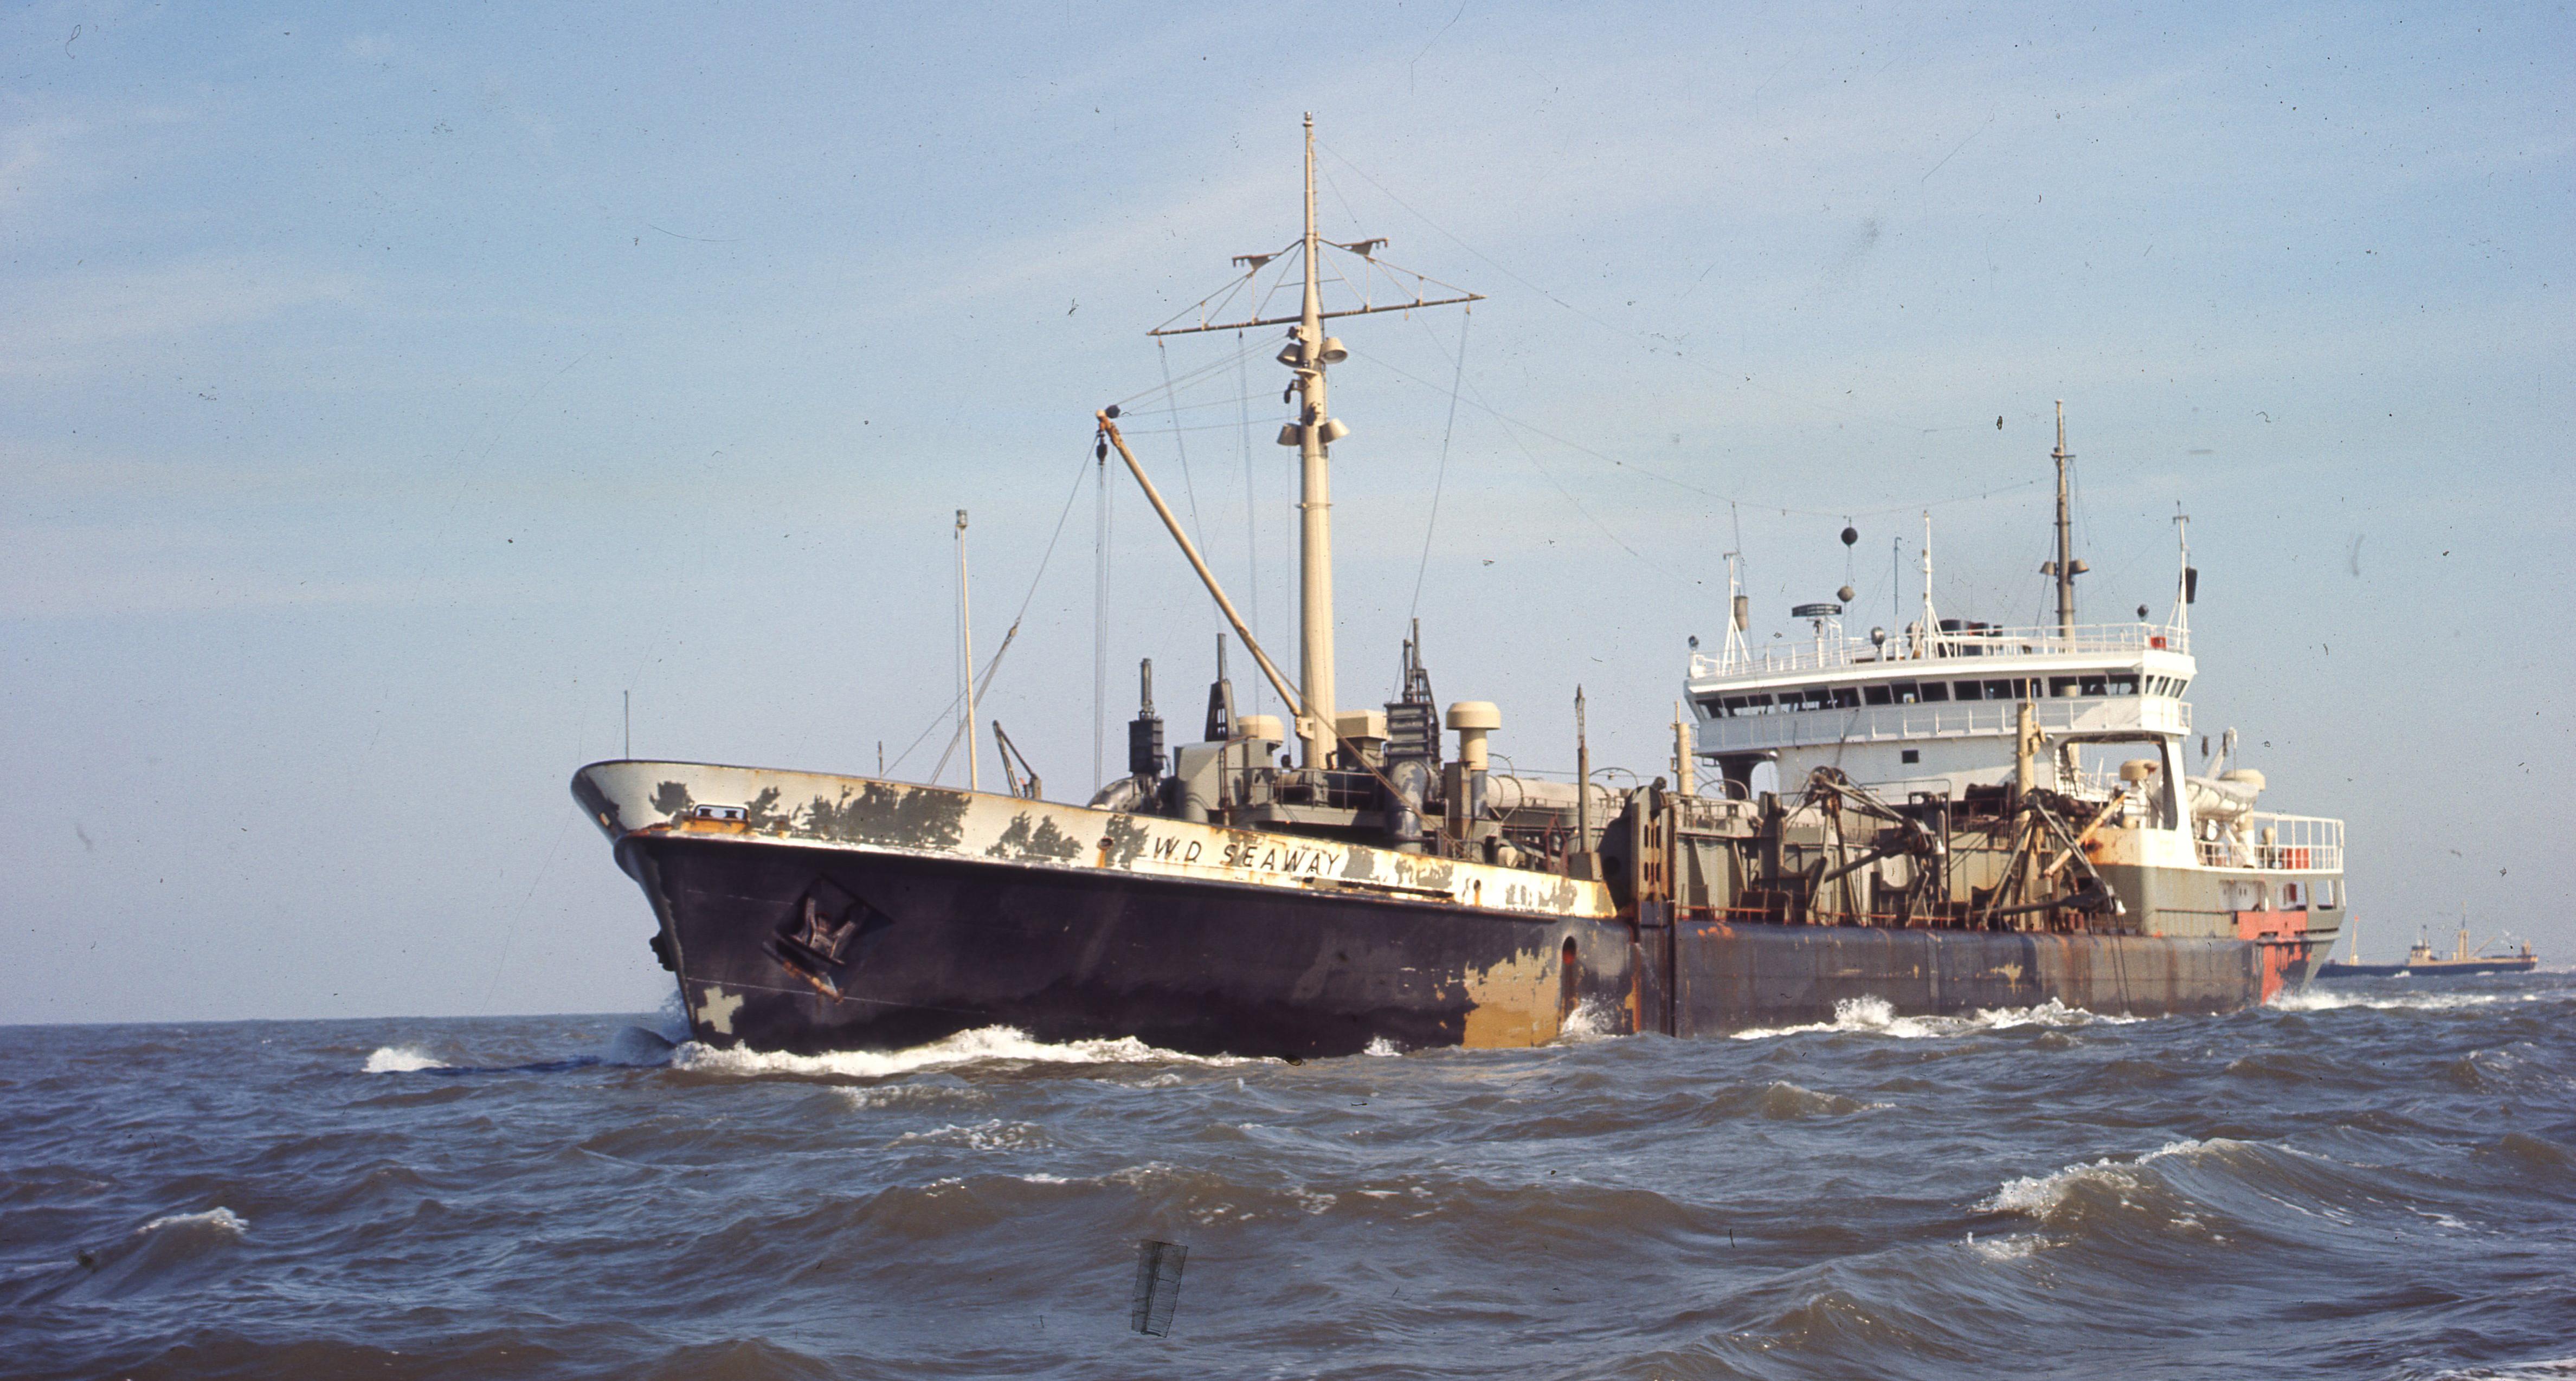 W.D. Seaway